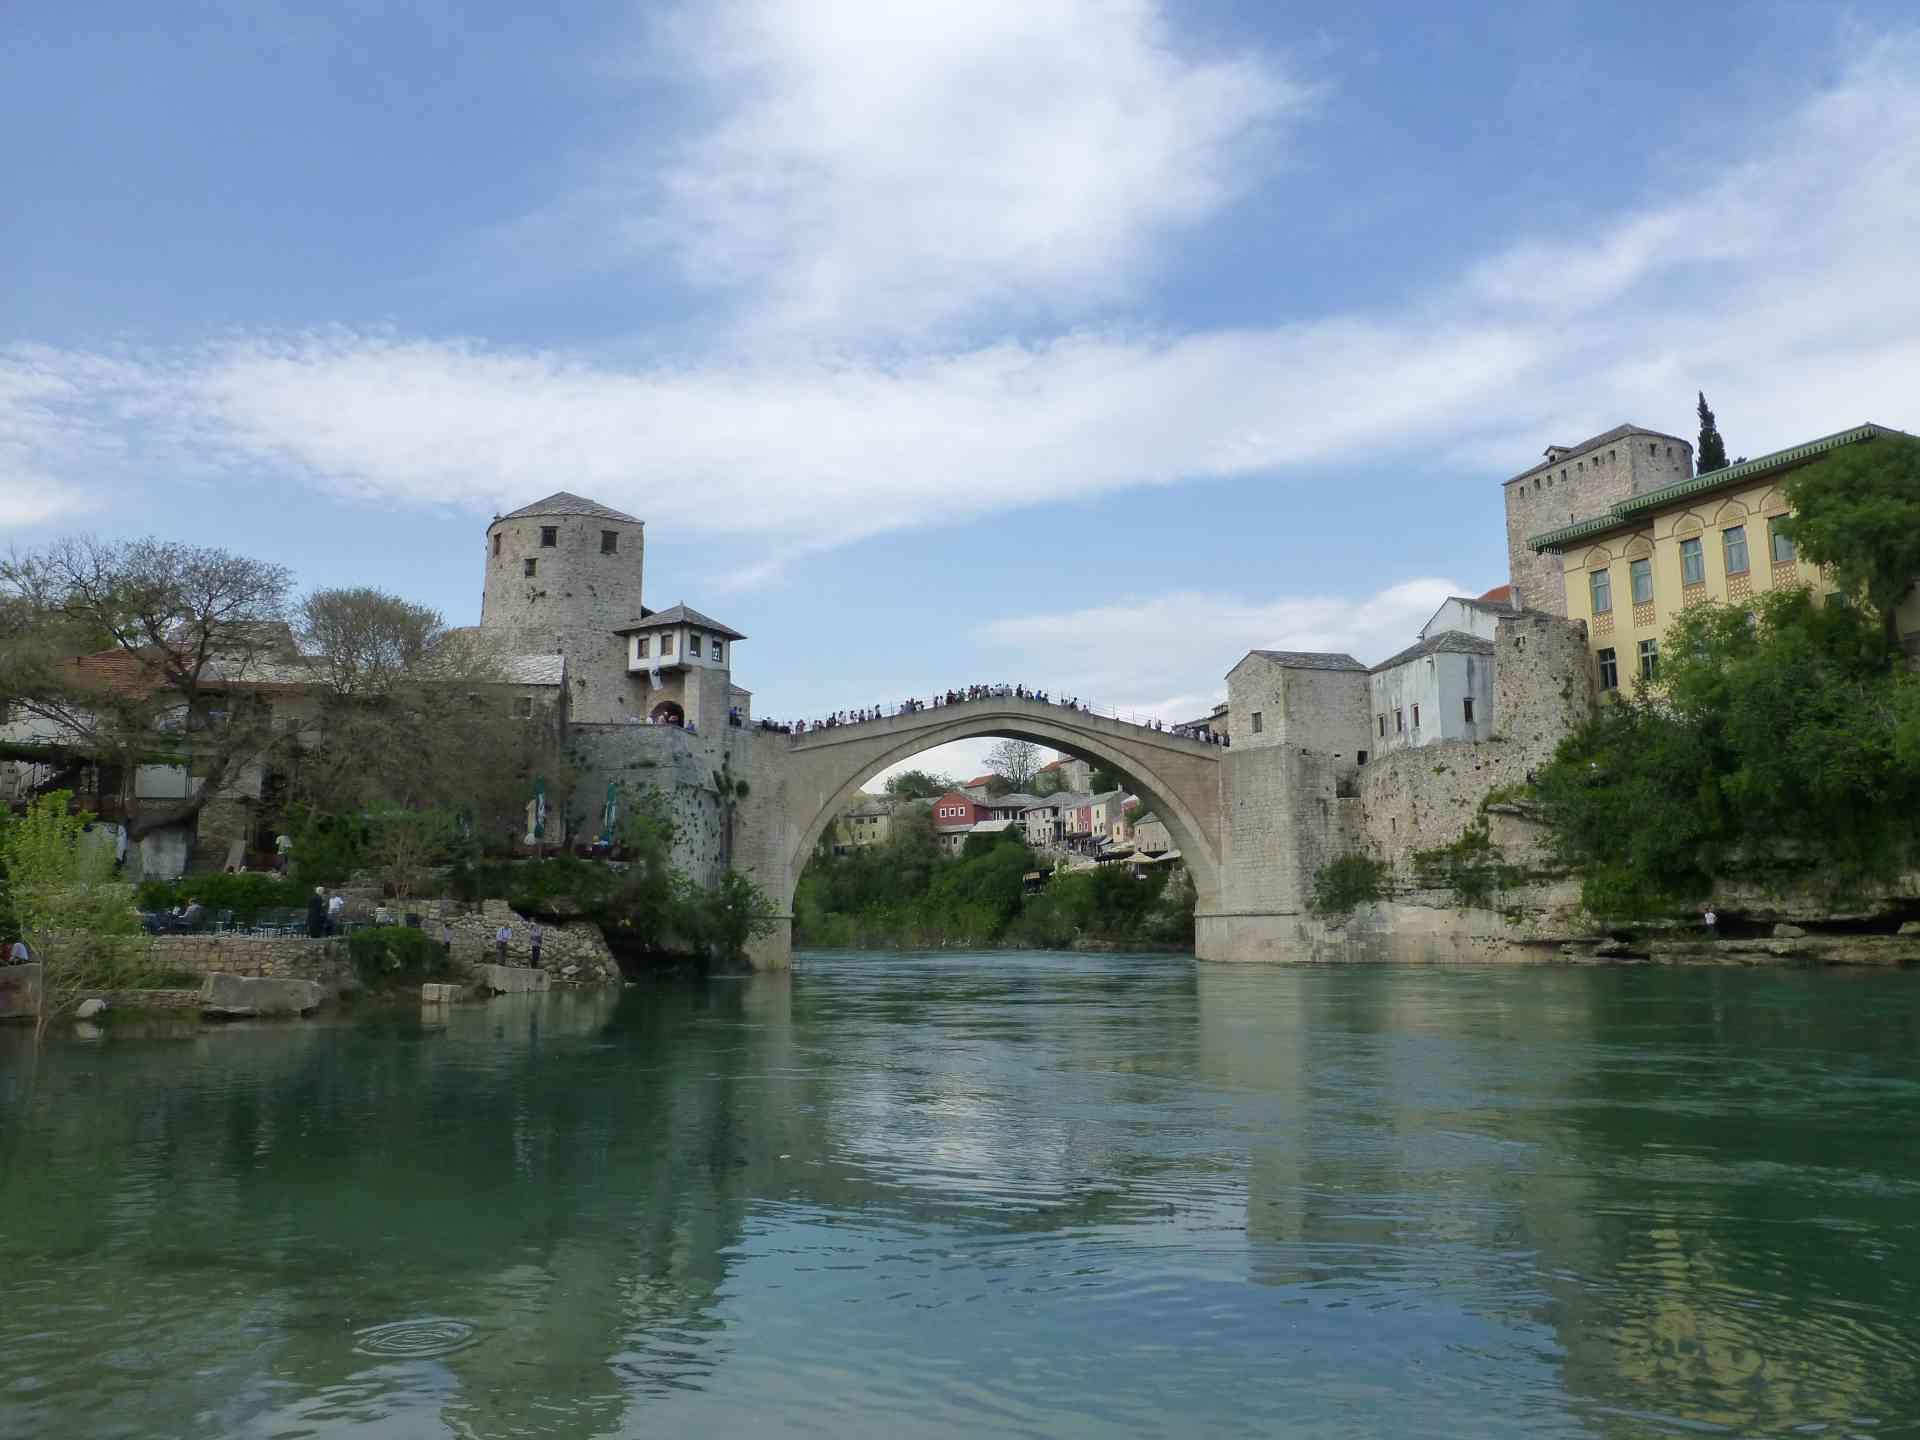 Mostar, Bosnia & Herzegovina by Dennis Bunnik